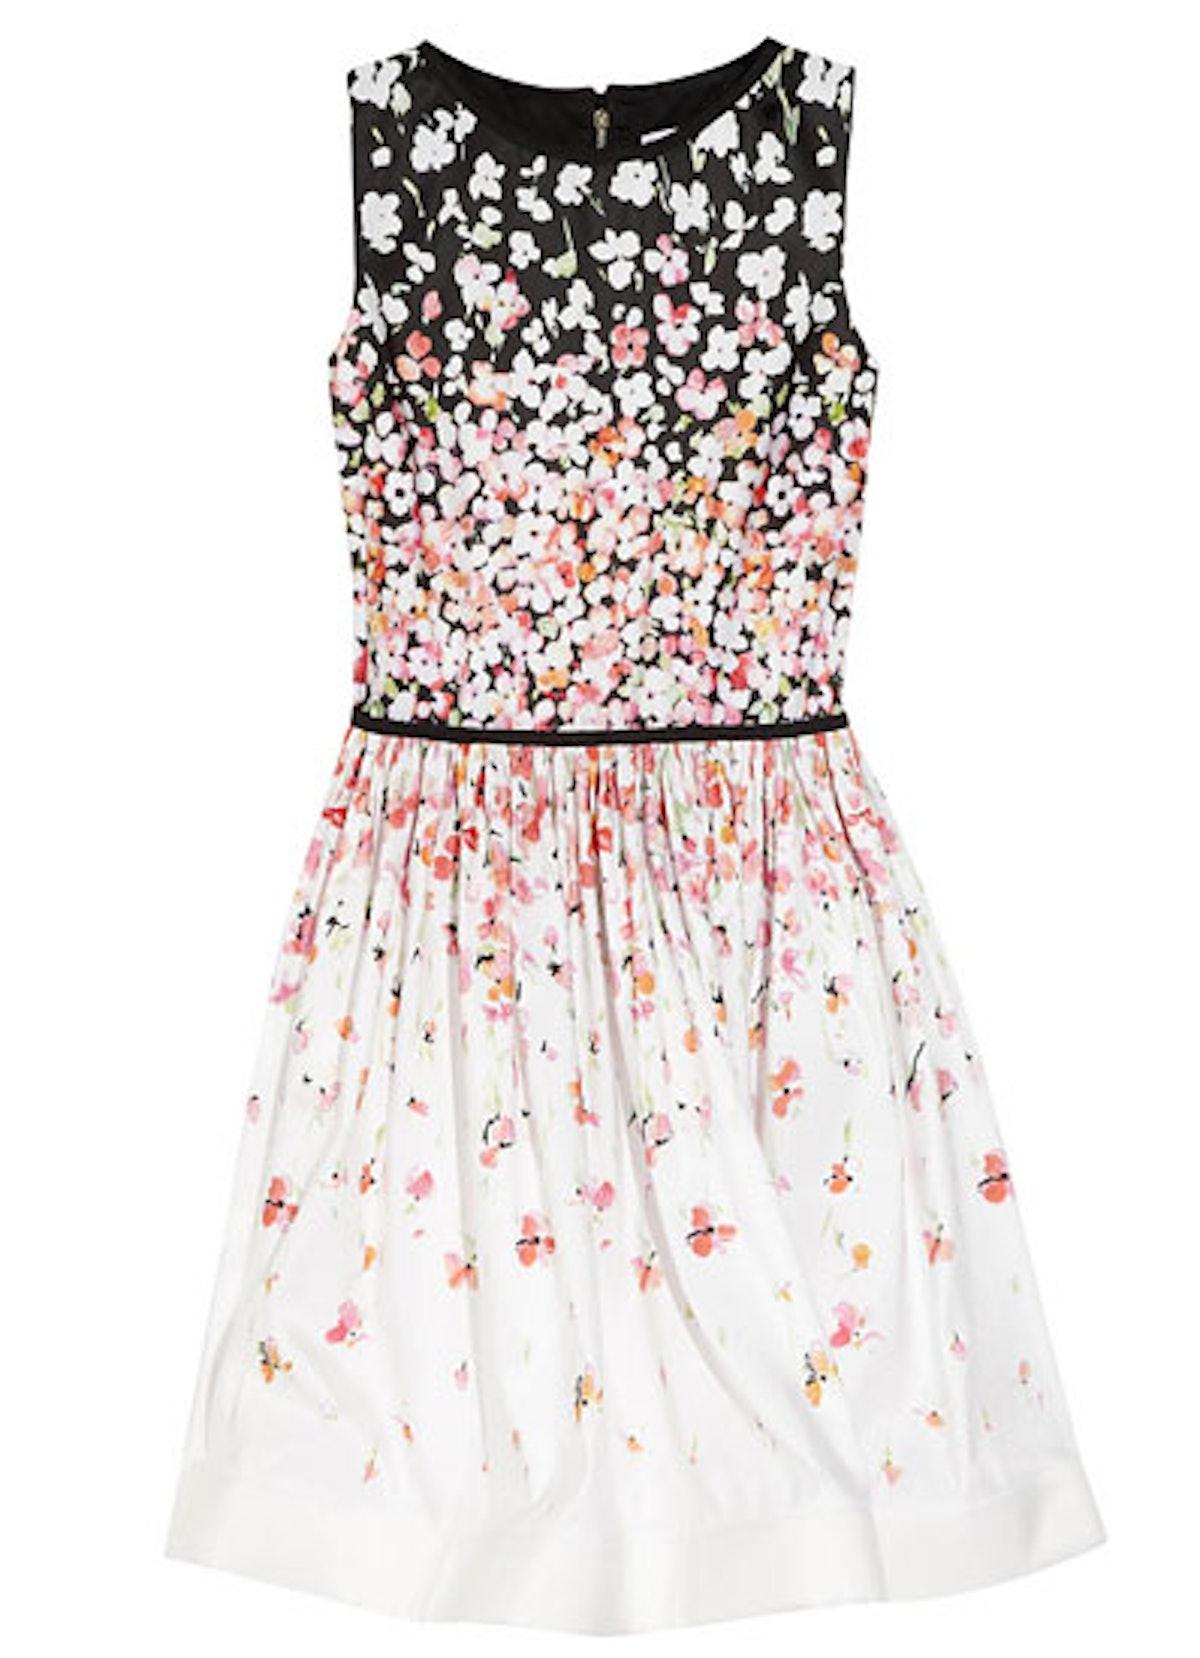 fass-floral-dresses-05-v.jpg